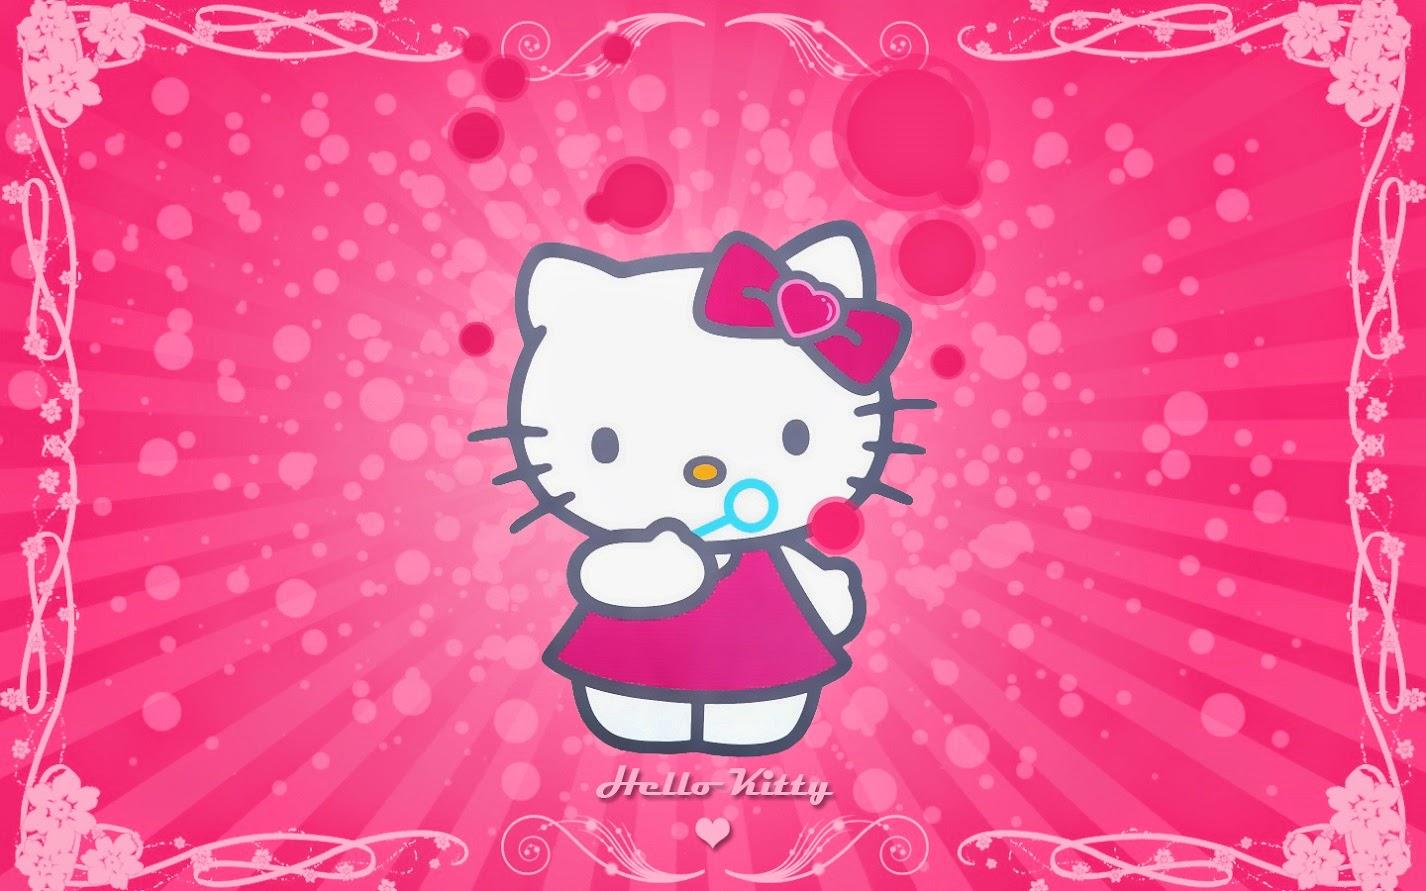 Best Wallpaper Hello Kitty Sakura - 120392-Hello%2BKitty%2BBubbles%2BHD%2BWallpaperz  HD_419392.jpg